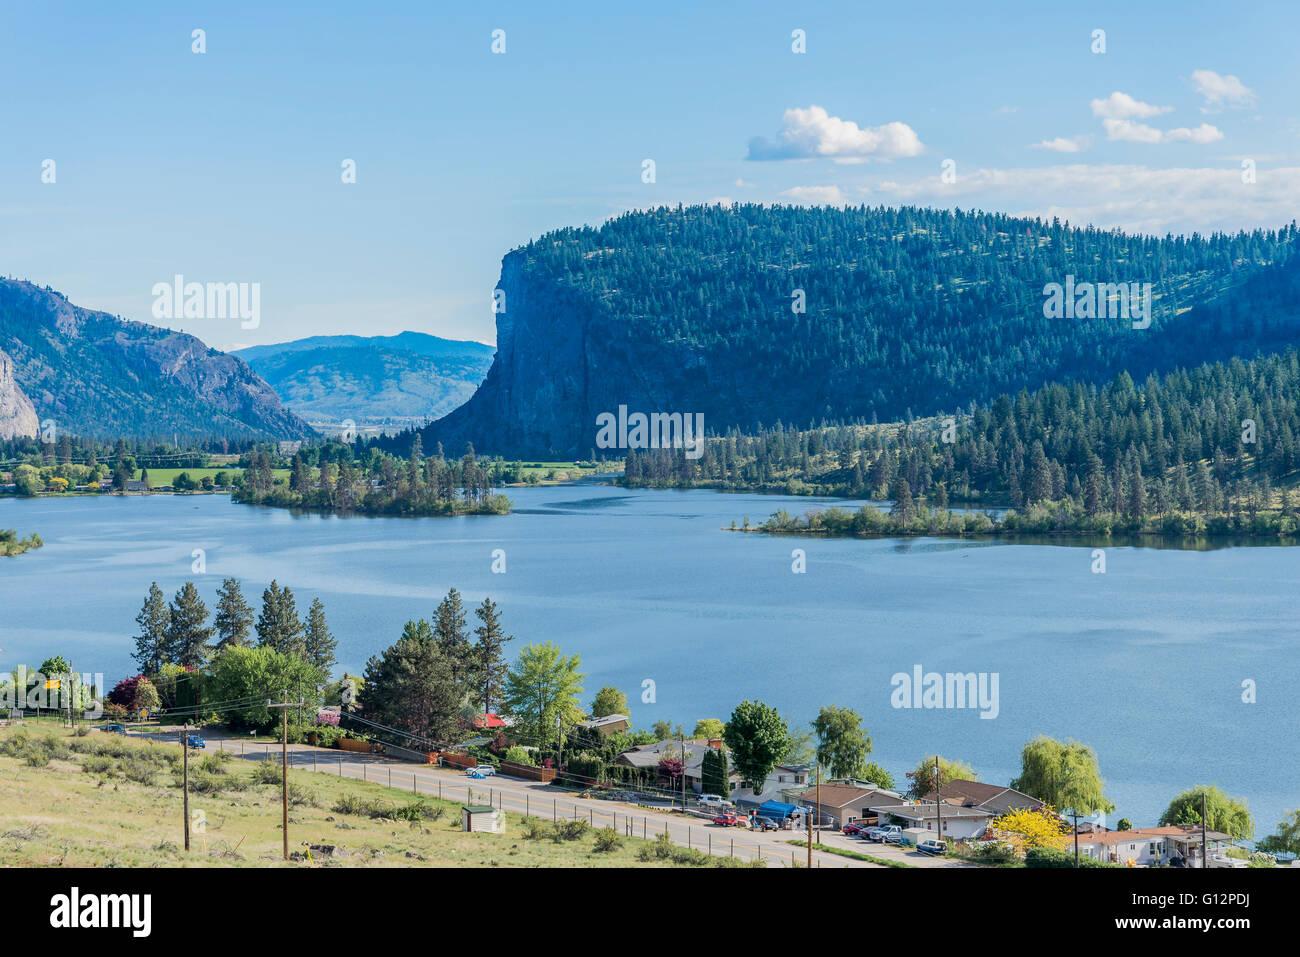 McIntyre Bluff, Vaseux Lake, Okanagan Valley, British Columbia, Canada - Stock Image